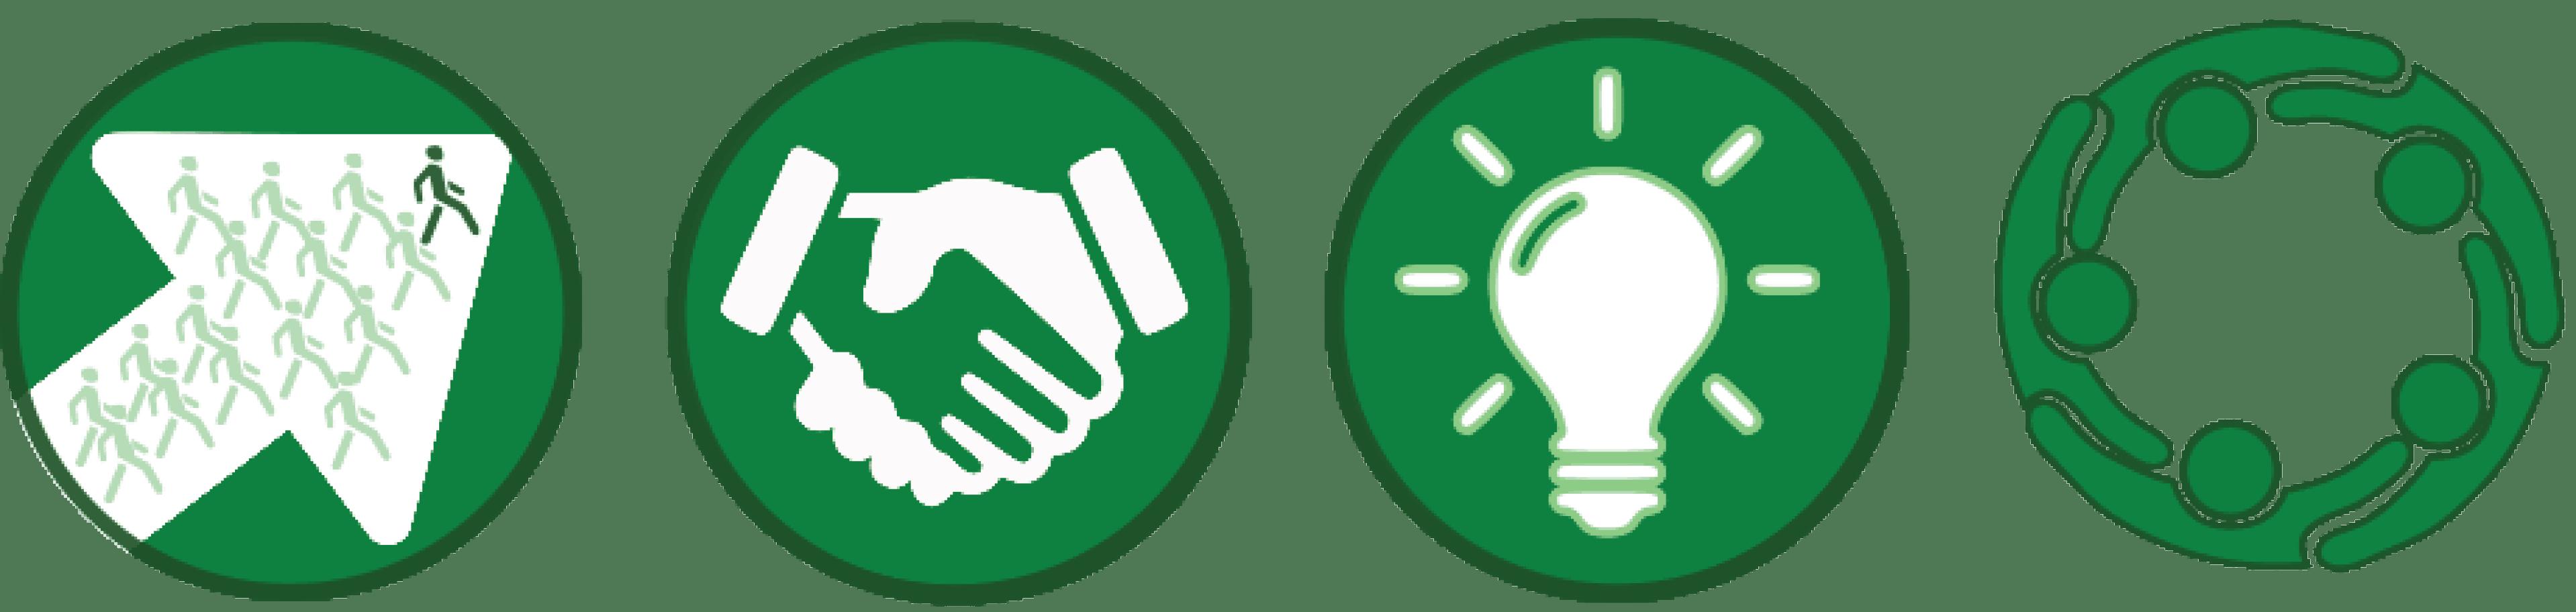 Project Pathway Program Tools: Leadership, Employment, Entrepreneurship & Community